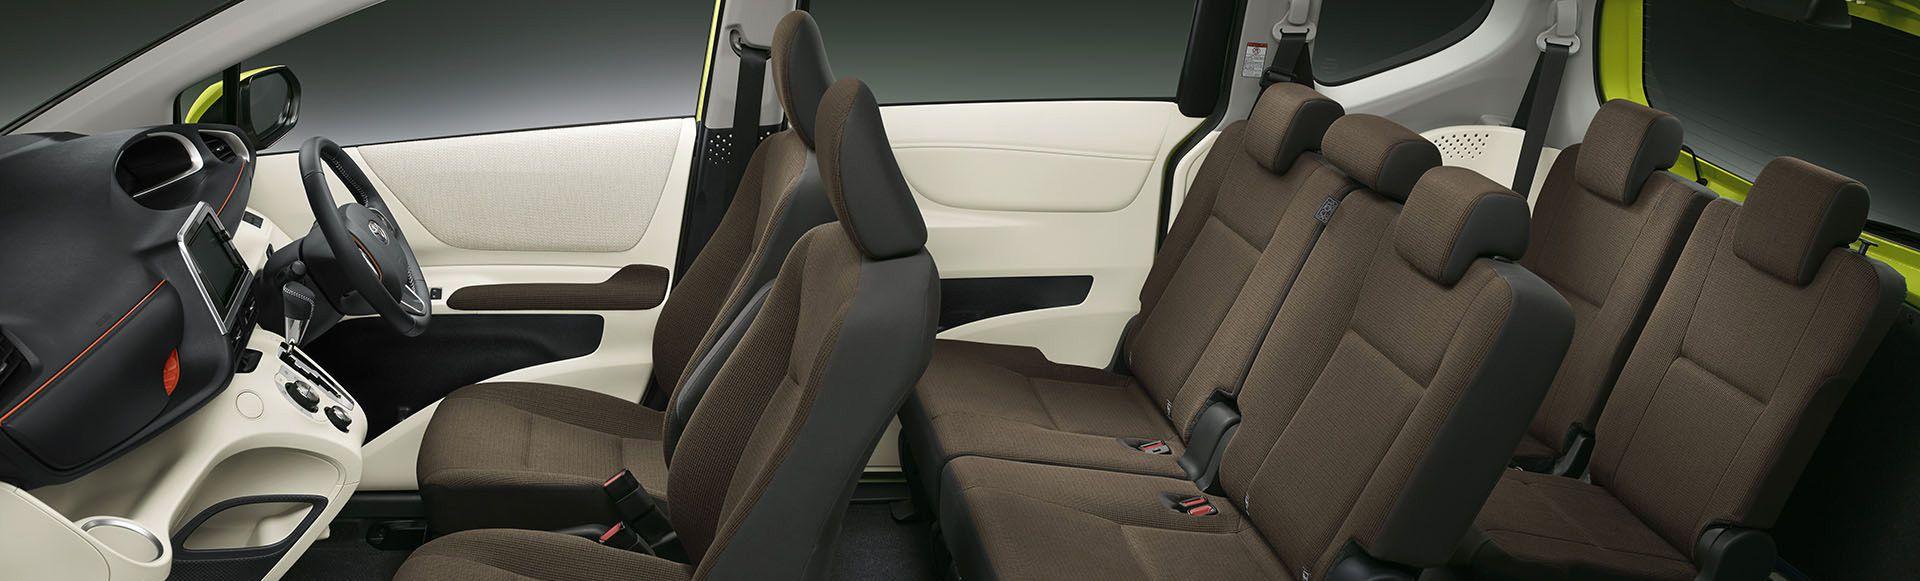 Kelebihan Kekurangan Toyota Sienta Spesifikasi